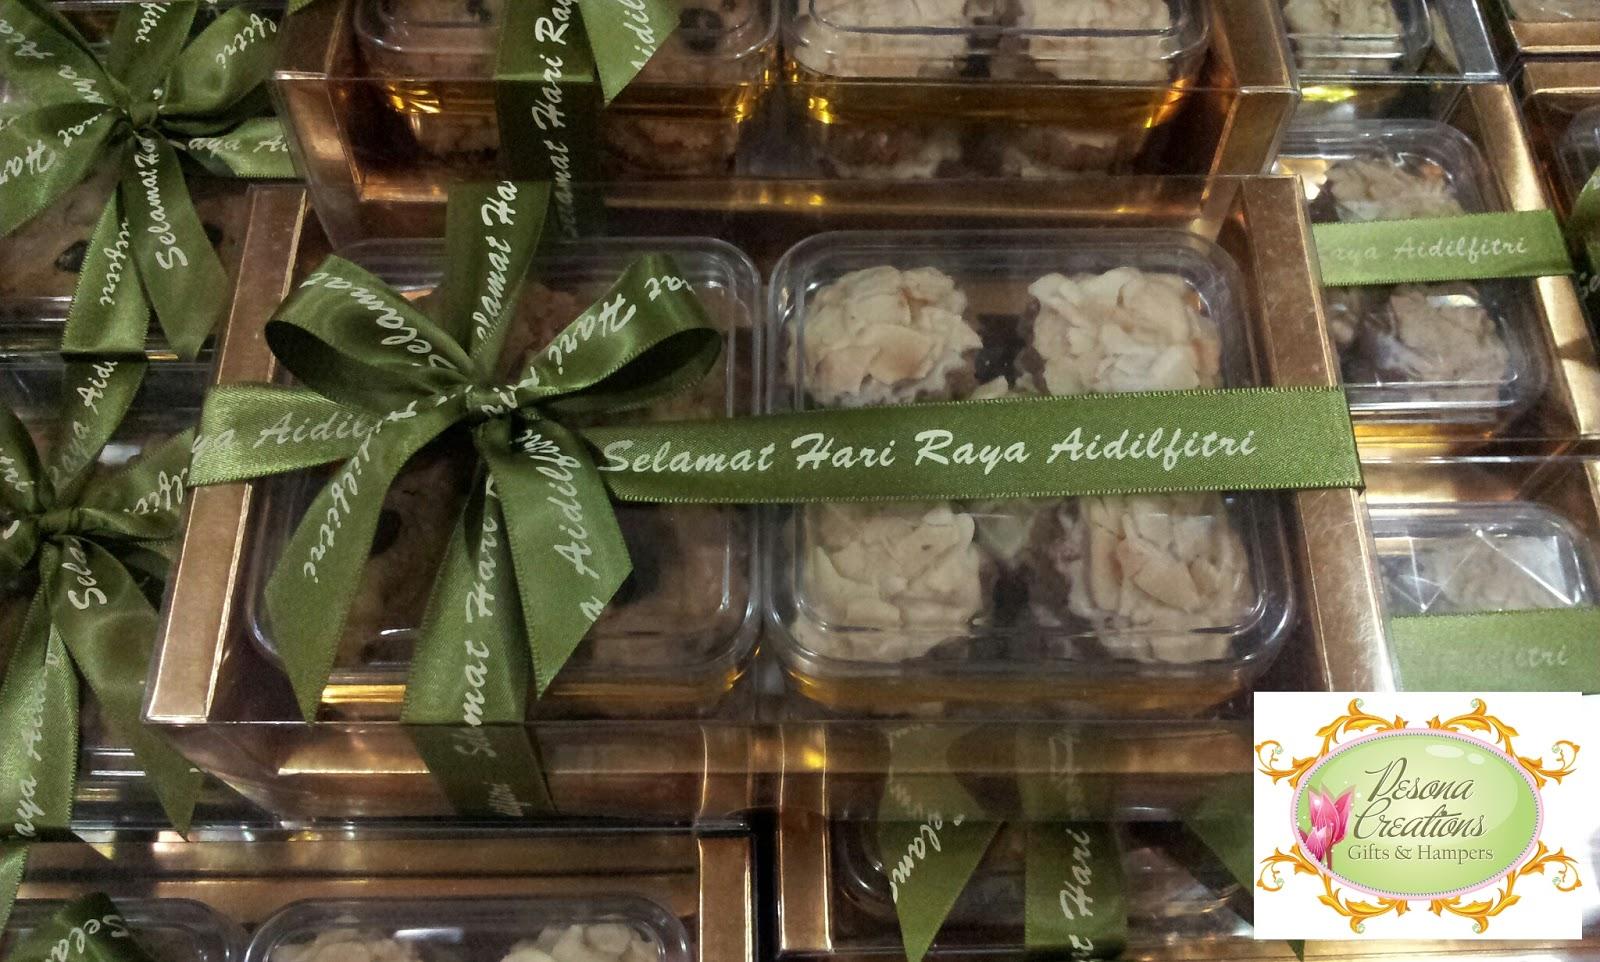 Pesona Creations Gifts & Hampers: Hamper Biskut Raya